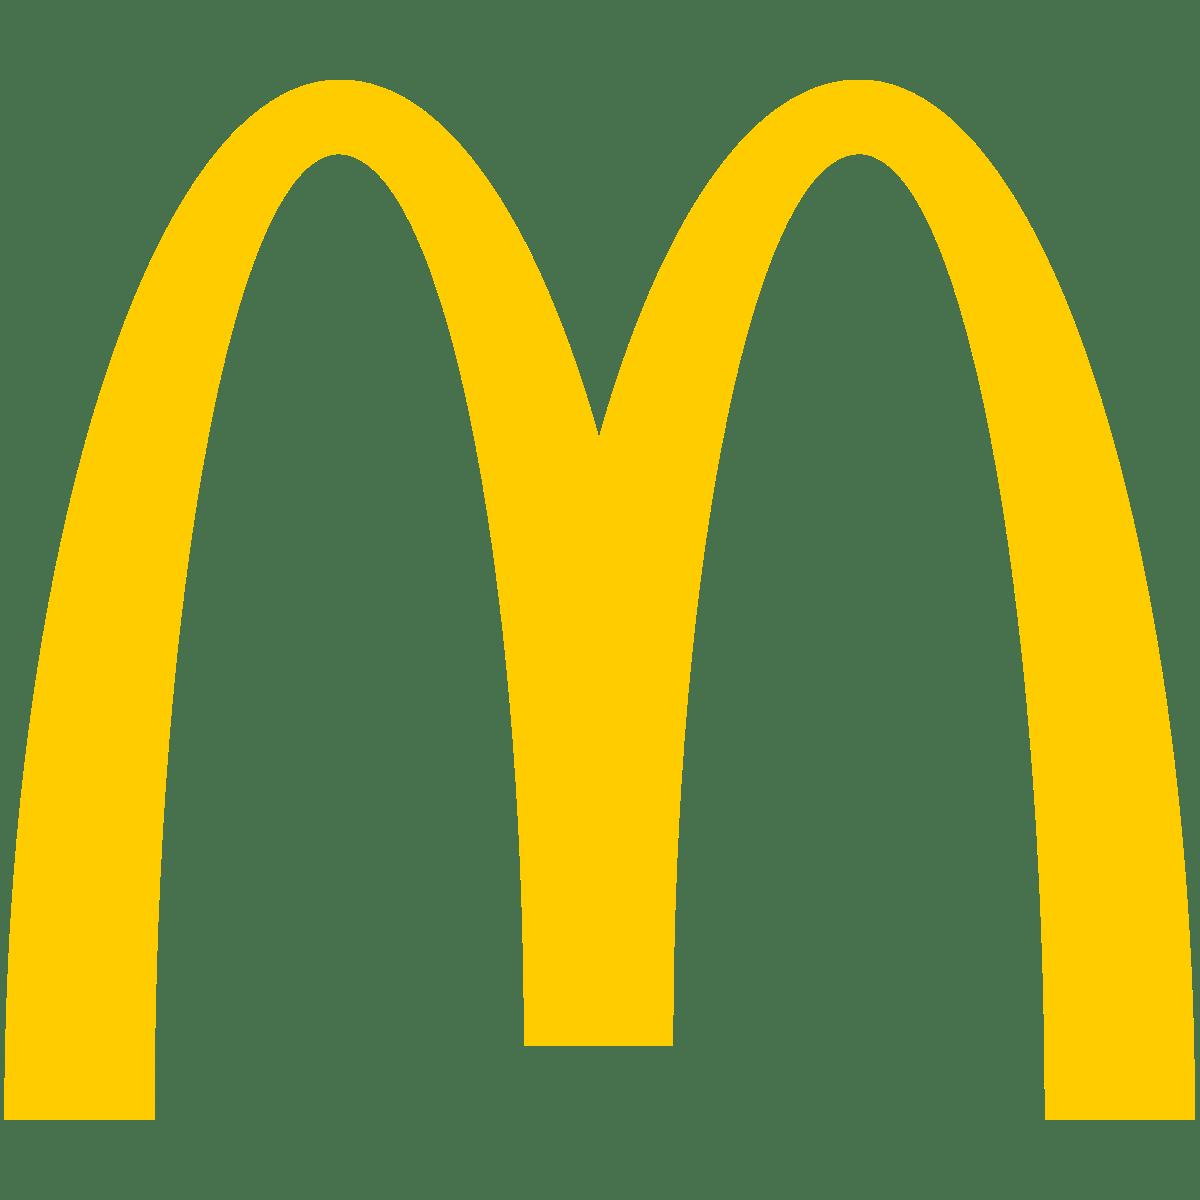 McDonalds Transparent Image